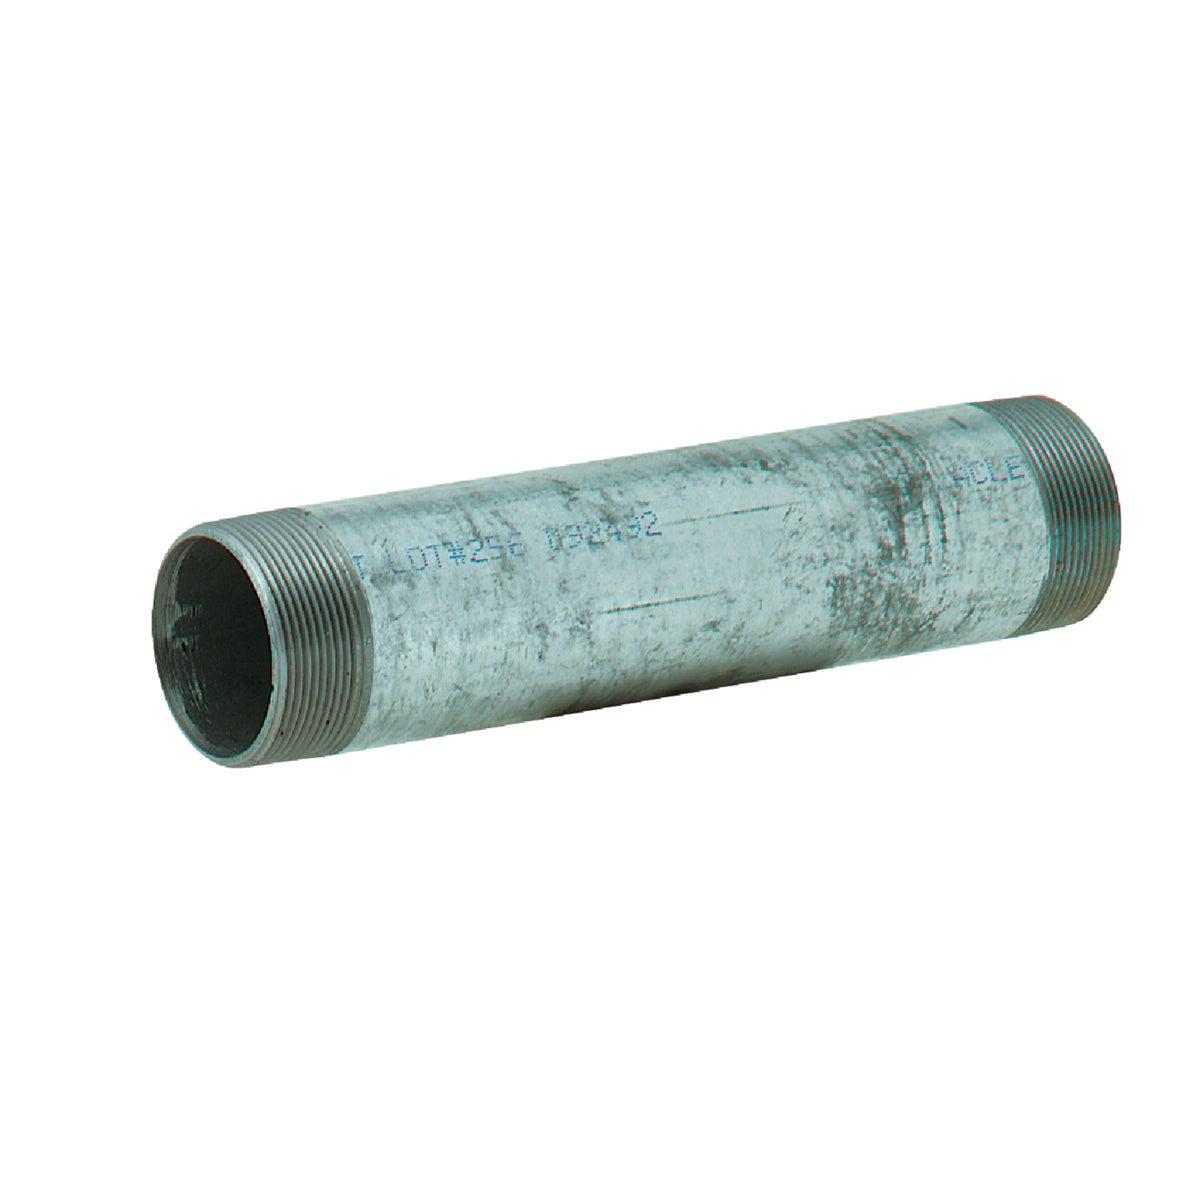 2X10 GALV NIPPLE - 8700155750 by Anvil International